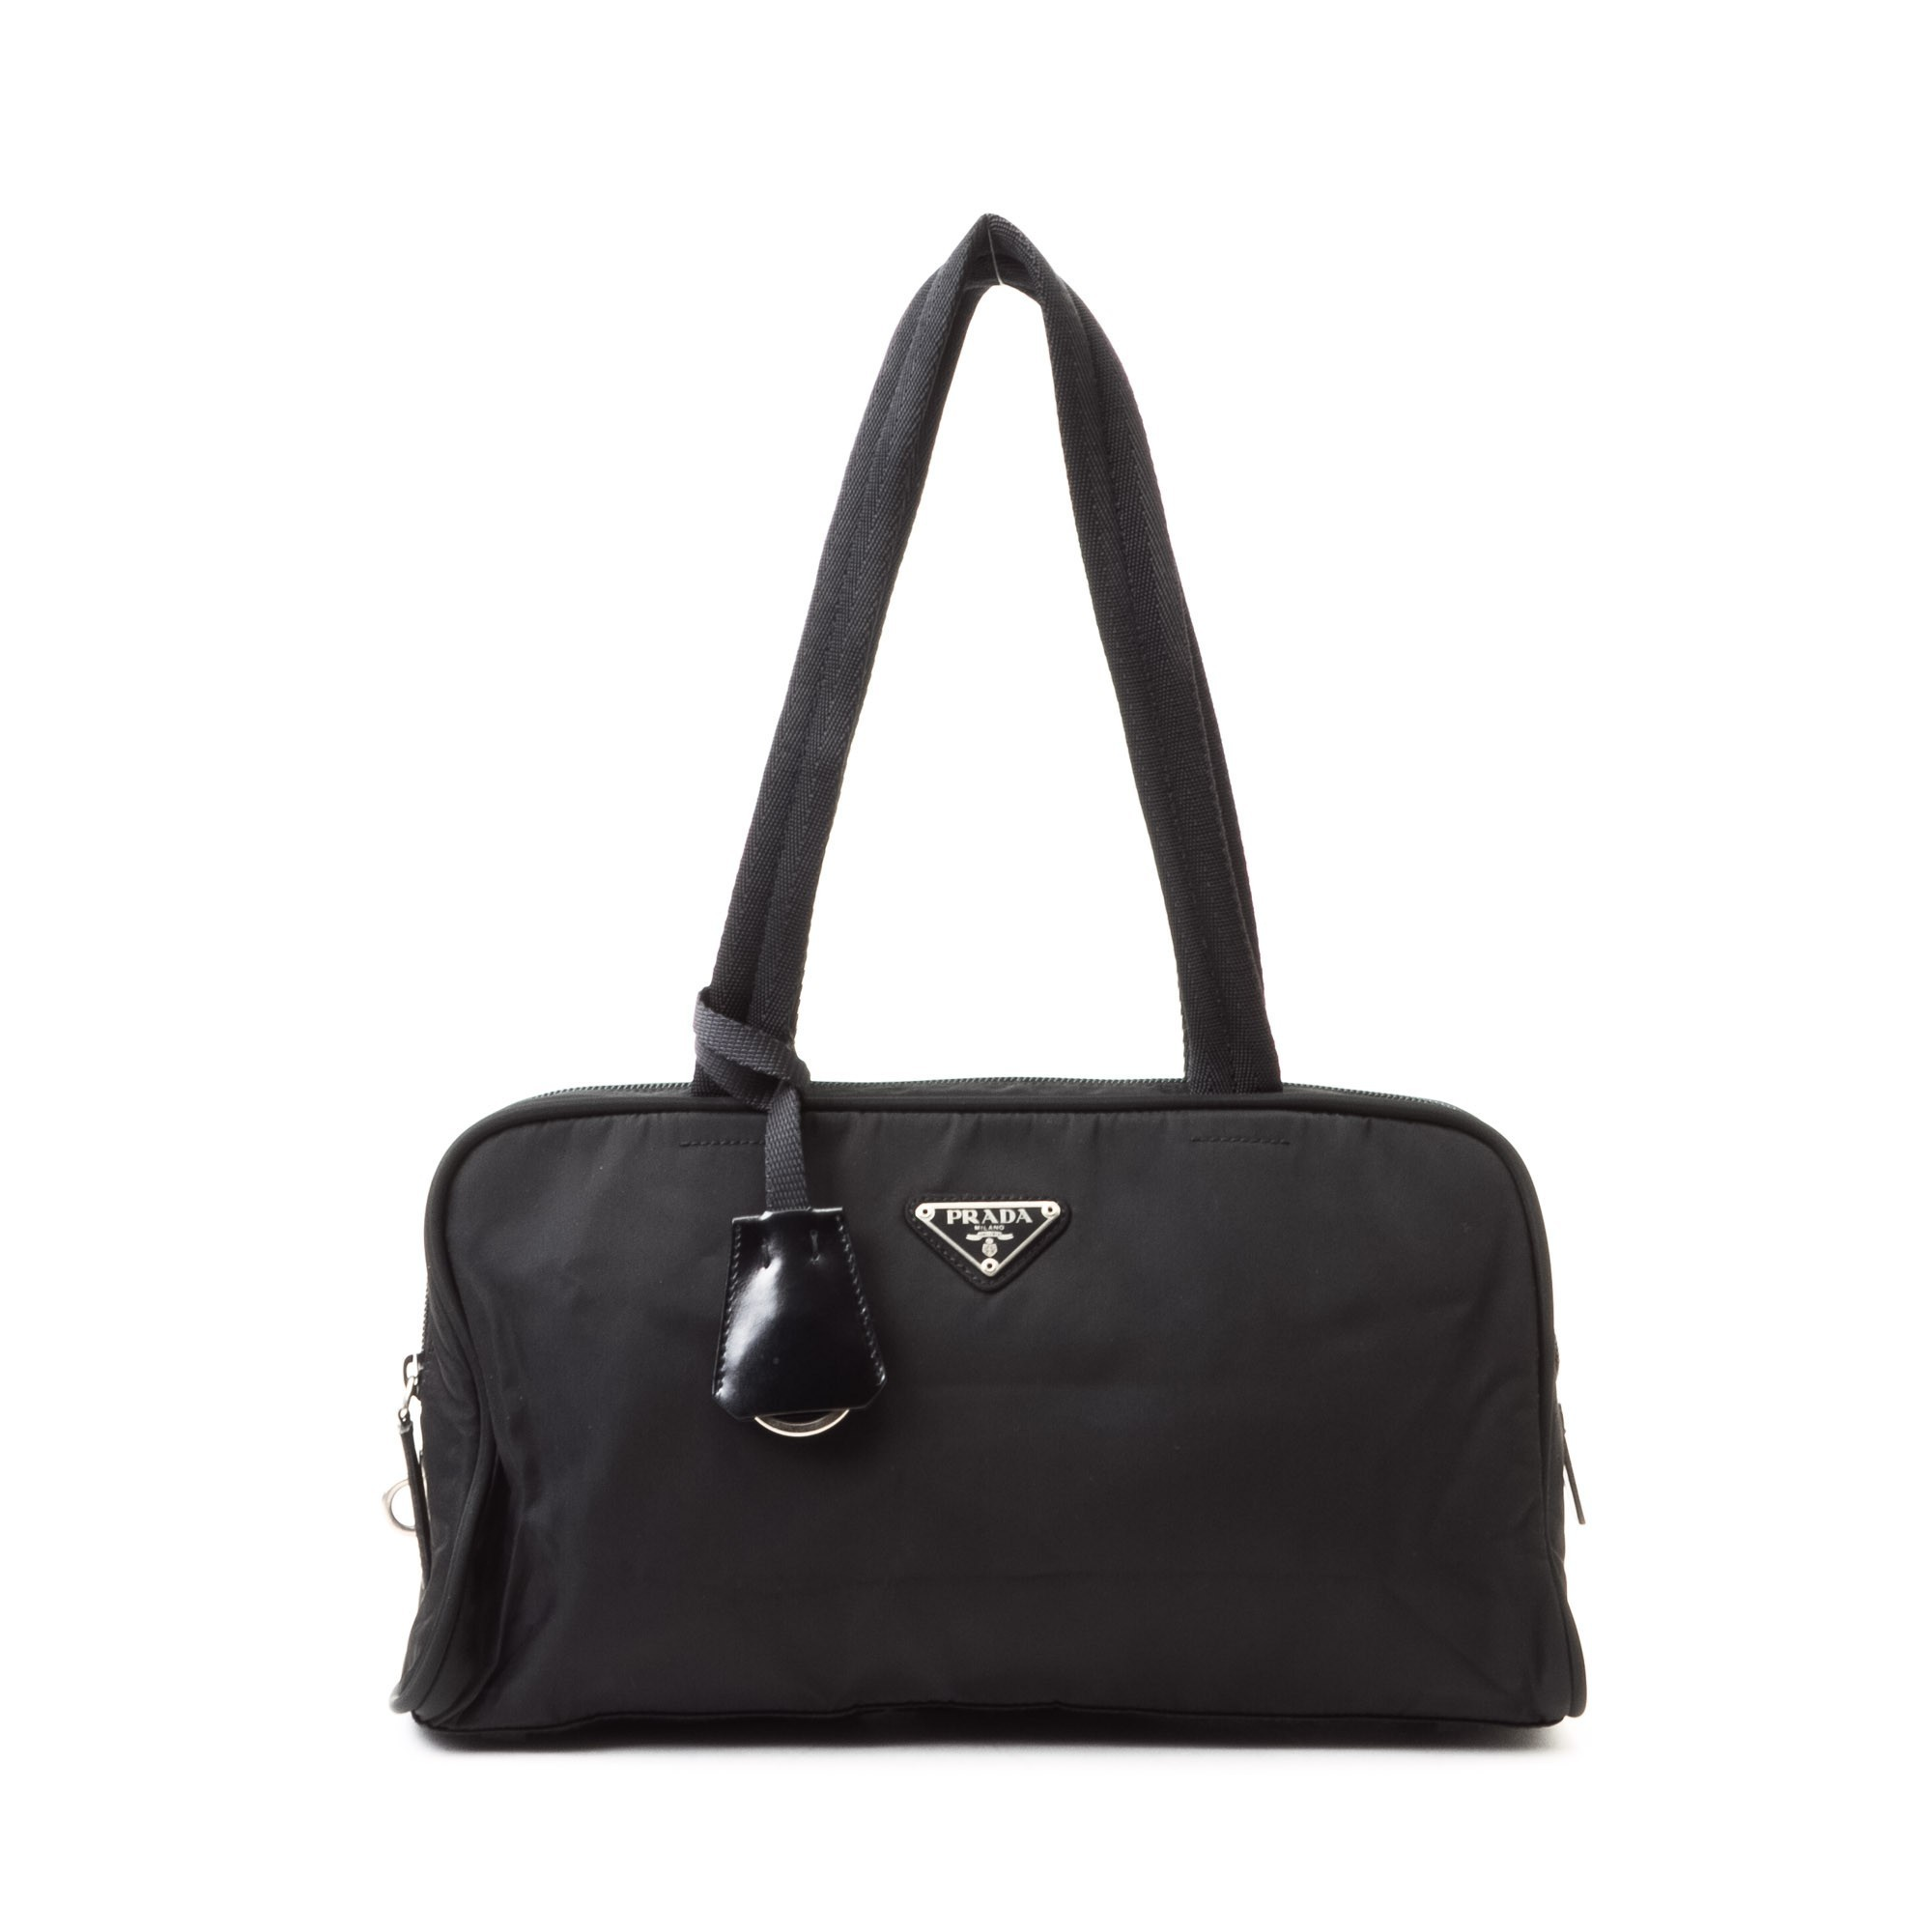 prada red flower bag - prada classic black nylon tote